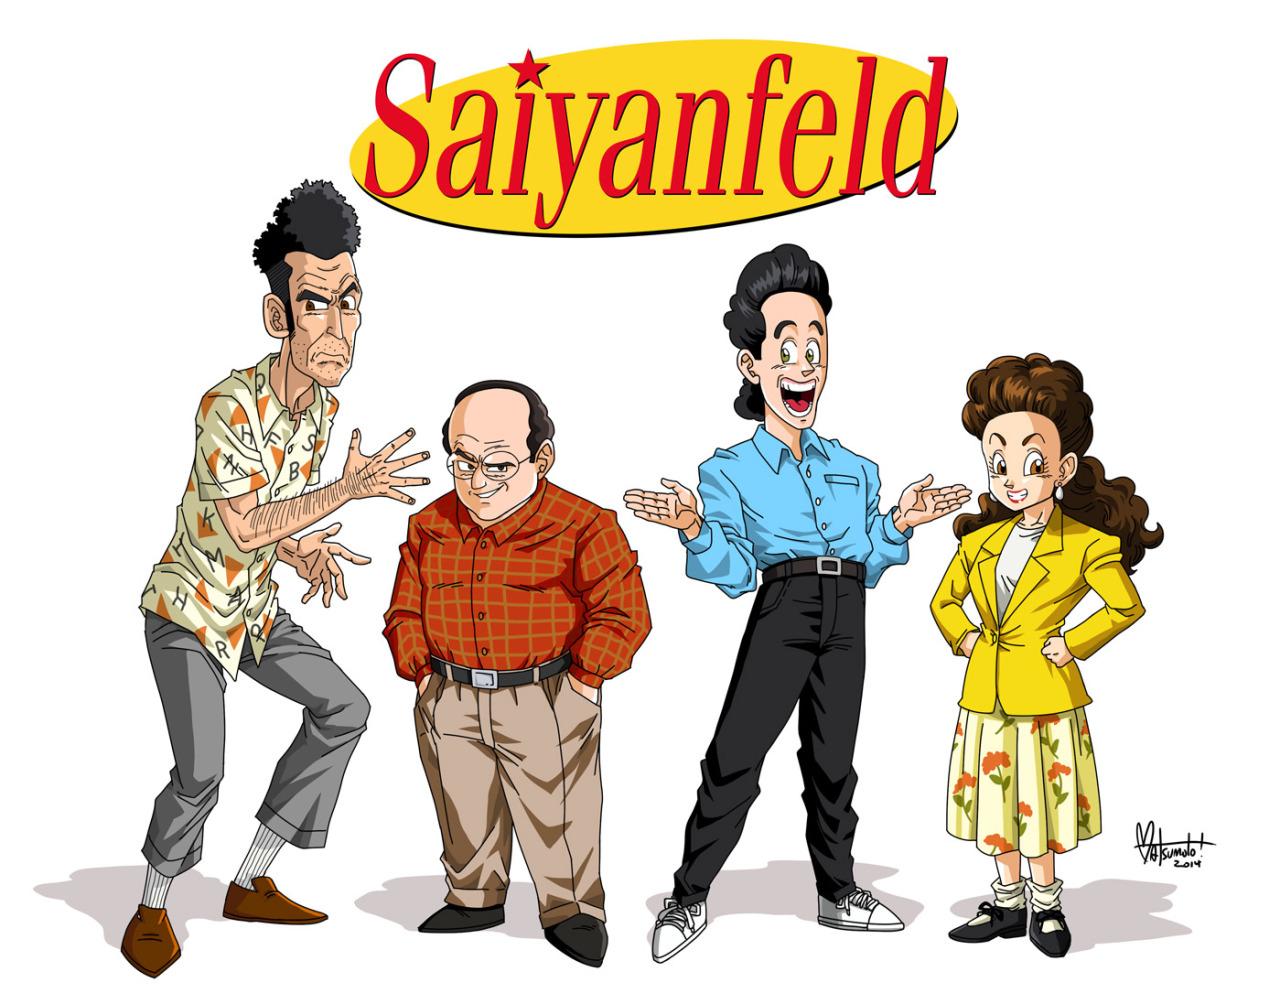 Saiyanfeld Anime Style Seinfeld Fanart